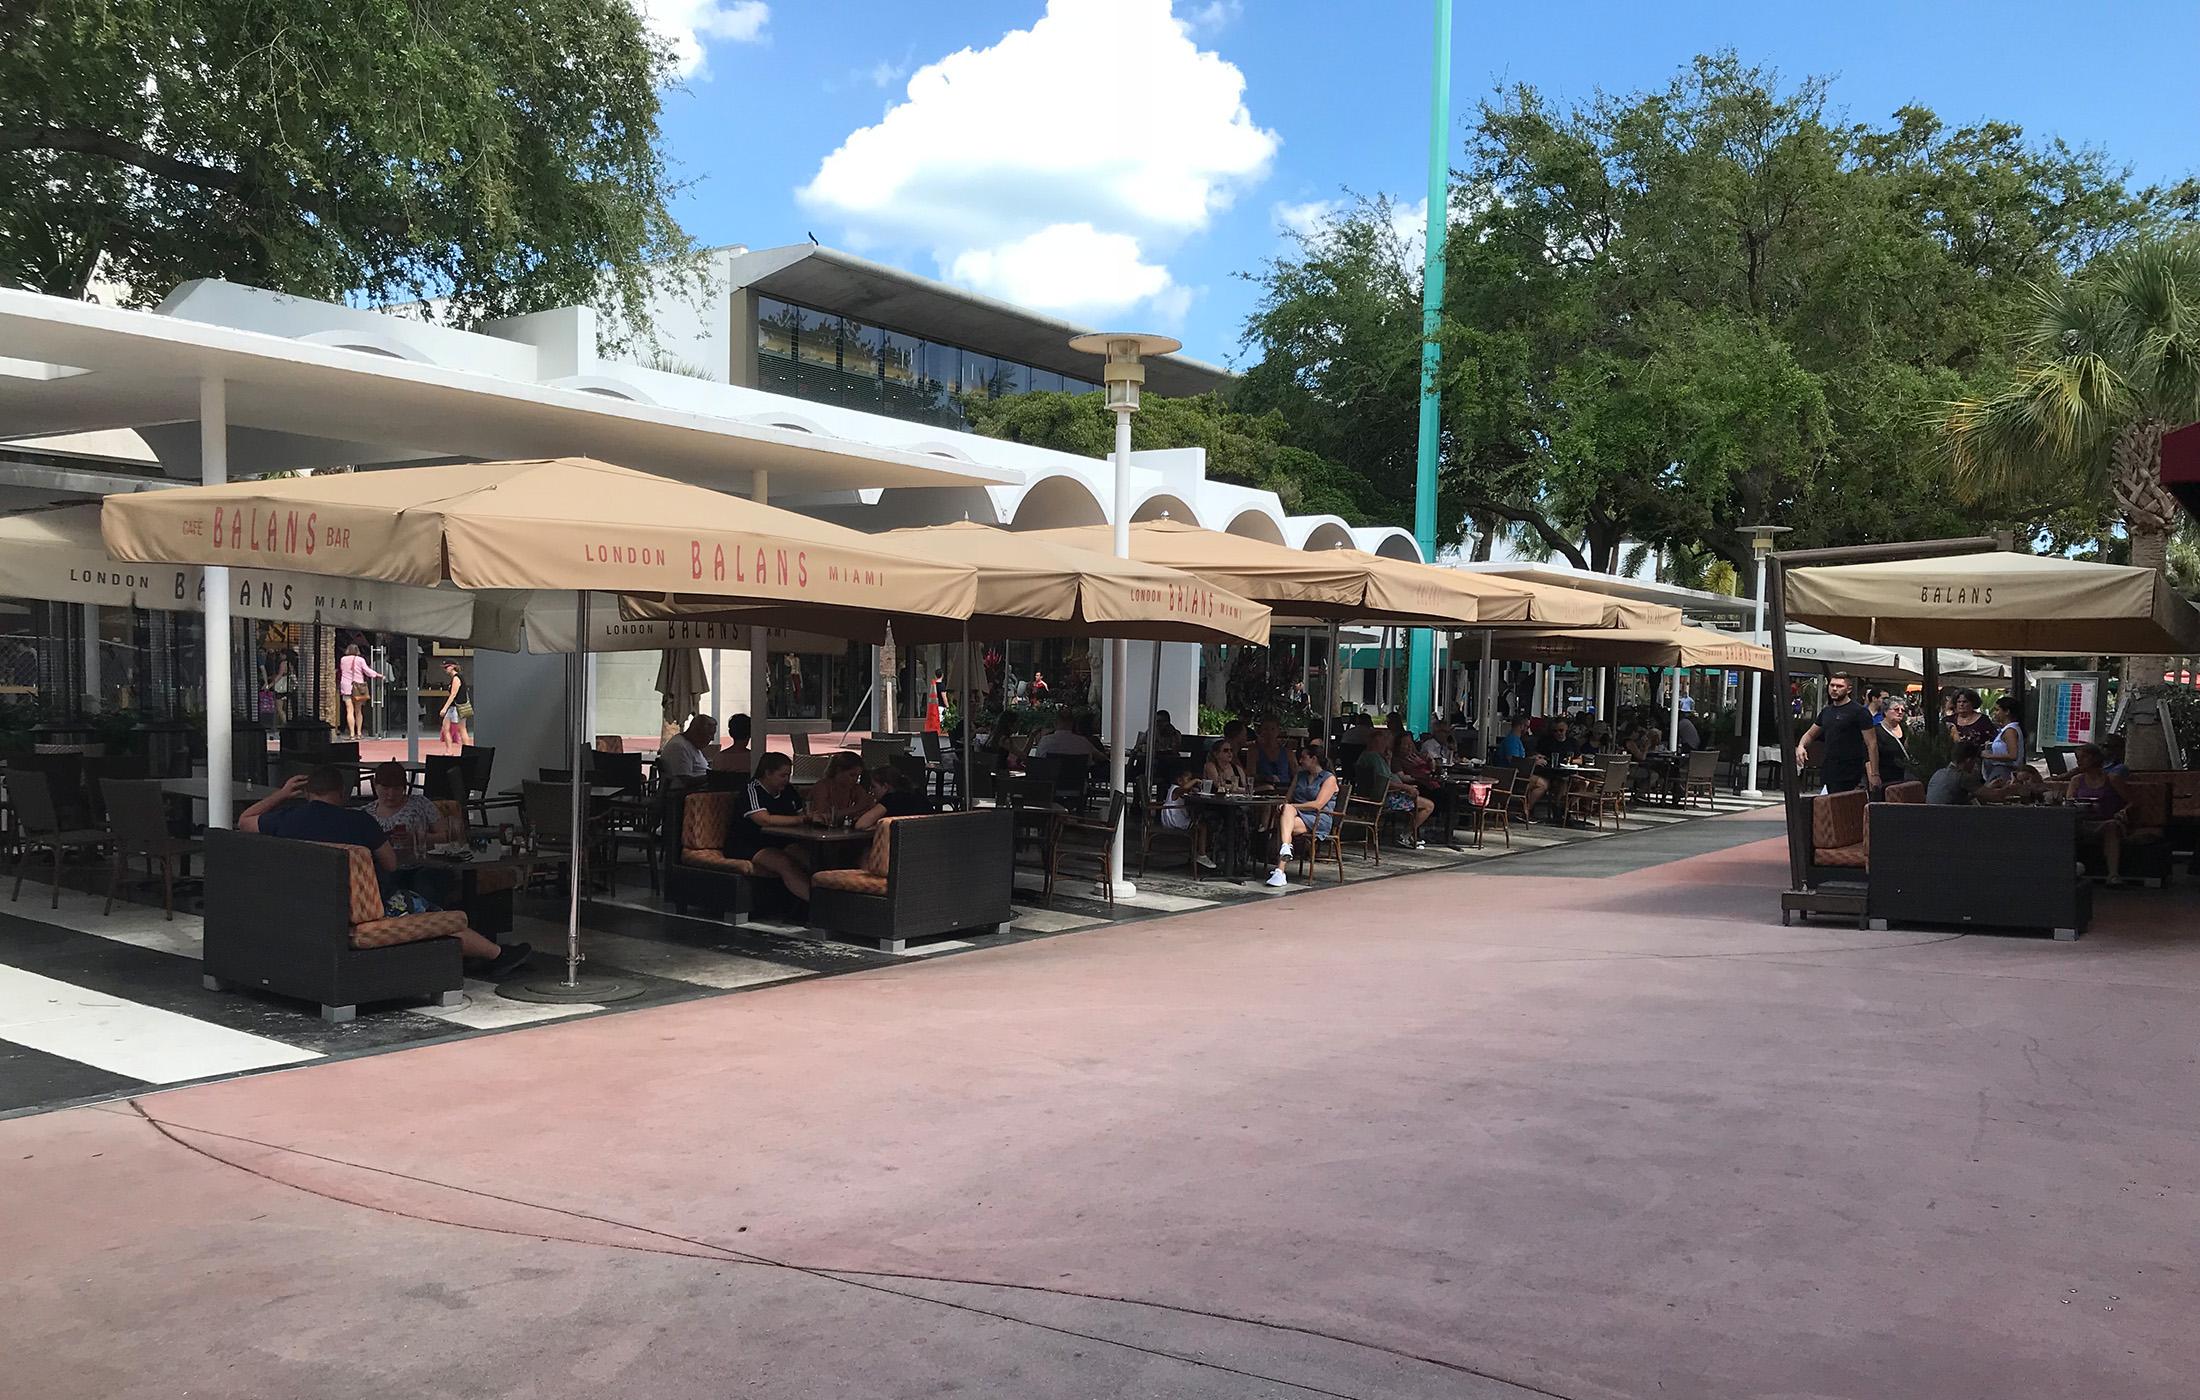 Lincoln Road BID restaurant outdoors